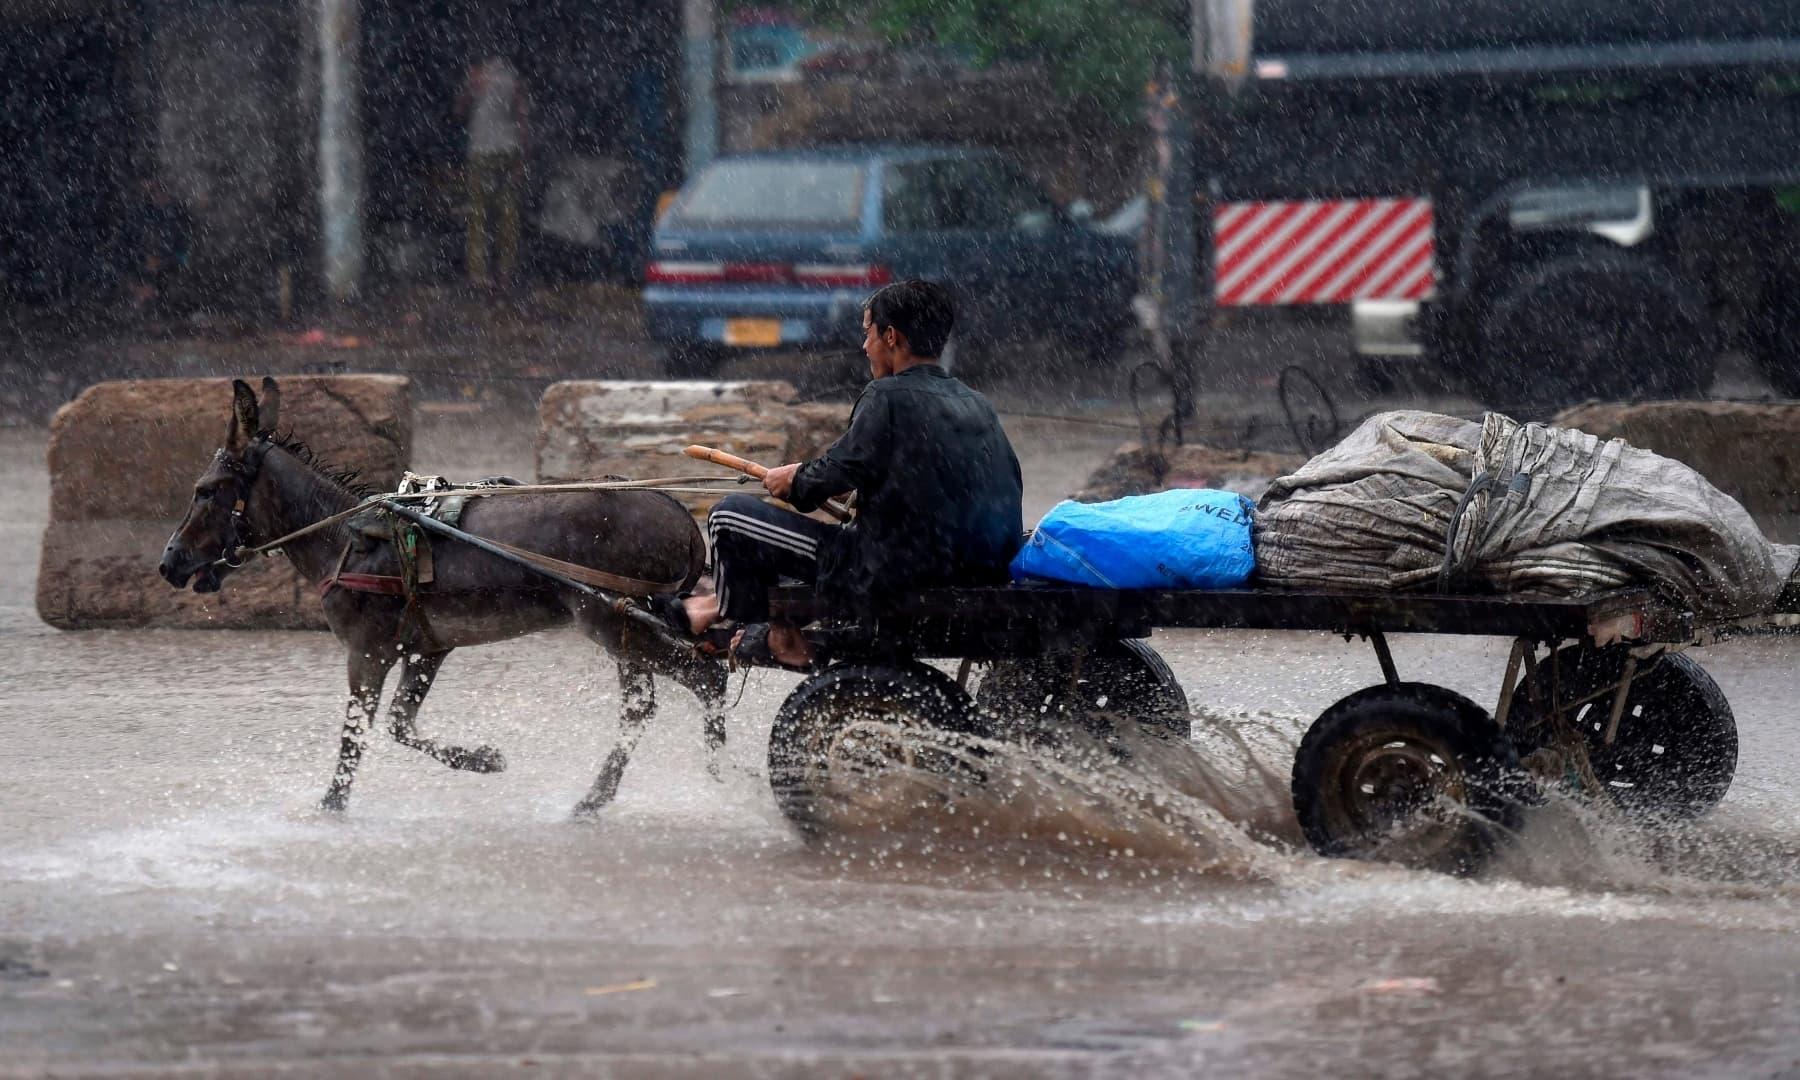 A man rides on a donkey cart during heavy monsoon rain in Karachi. — AFP